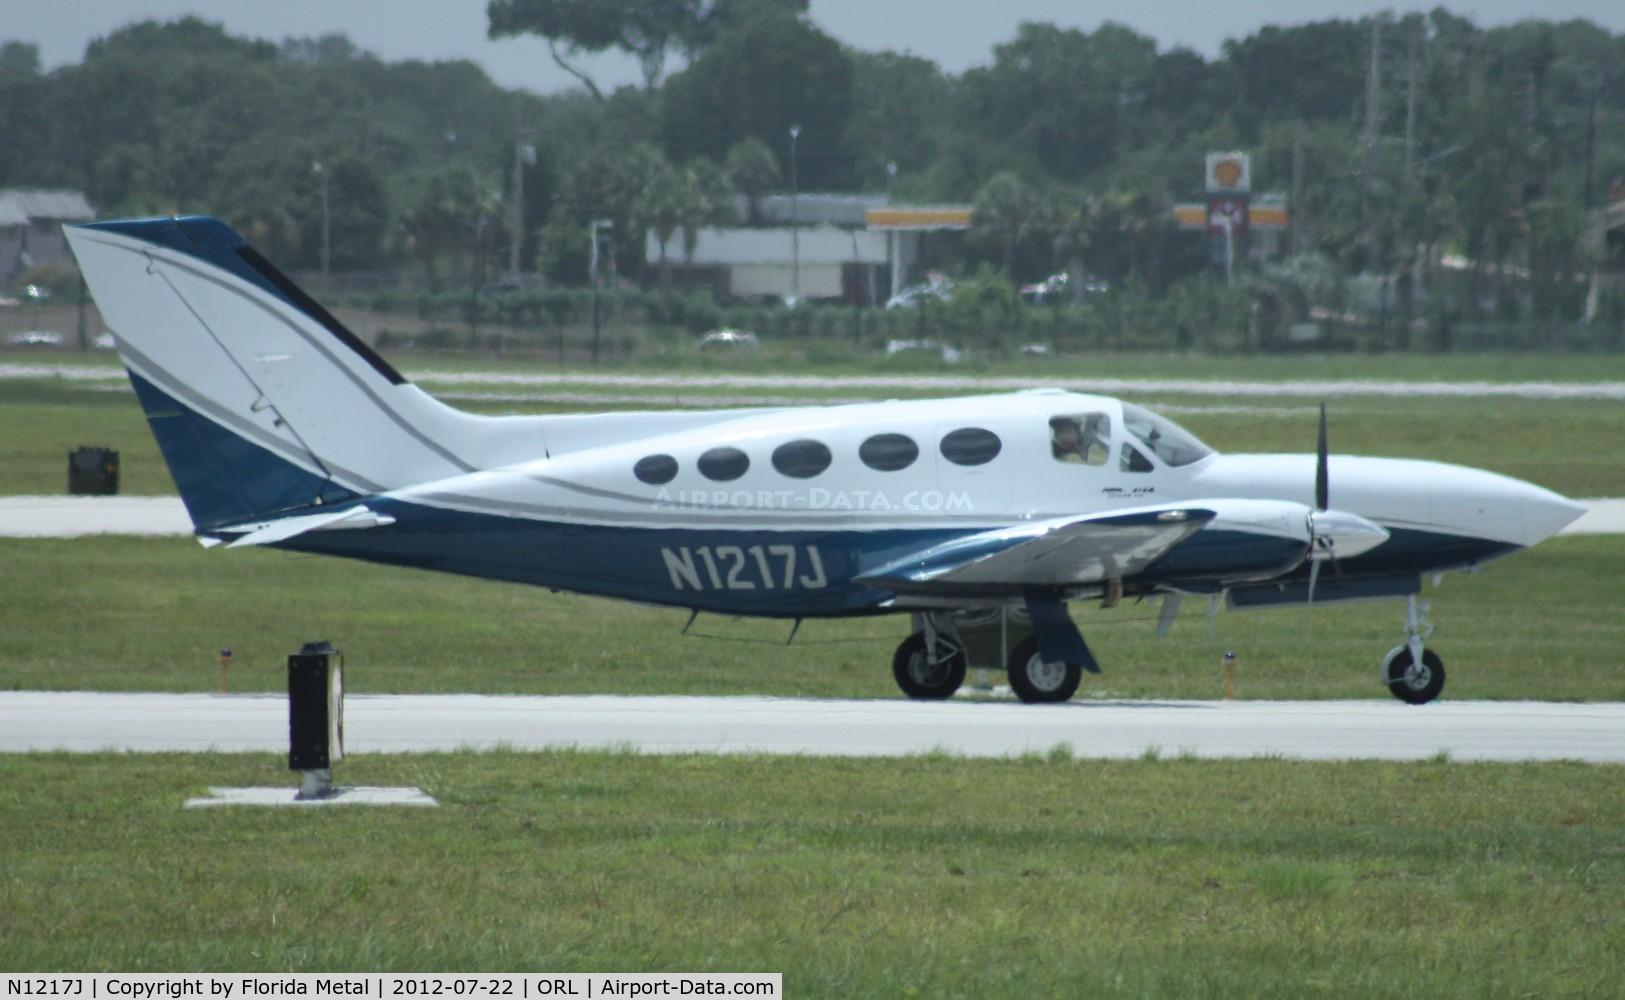 N1217J, 1980 Cessna 414A Chancellor C/N 414A0487, Cessna 414A